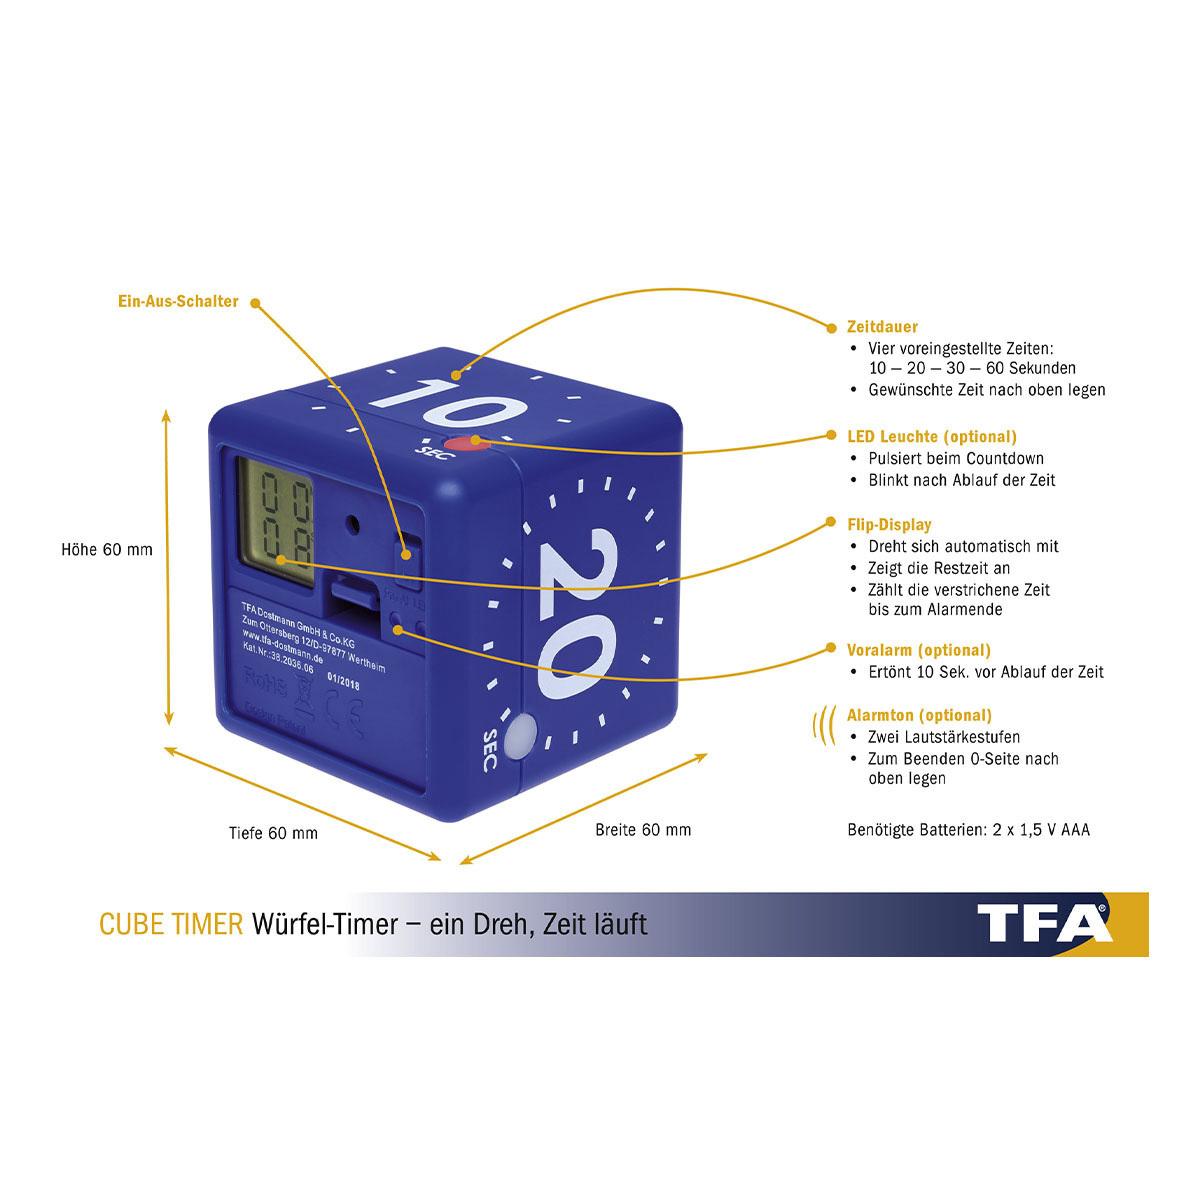 38-2036-06-digitaler-würfel-timer-cube-timer-abmessungen-1200x1200px.jpg